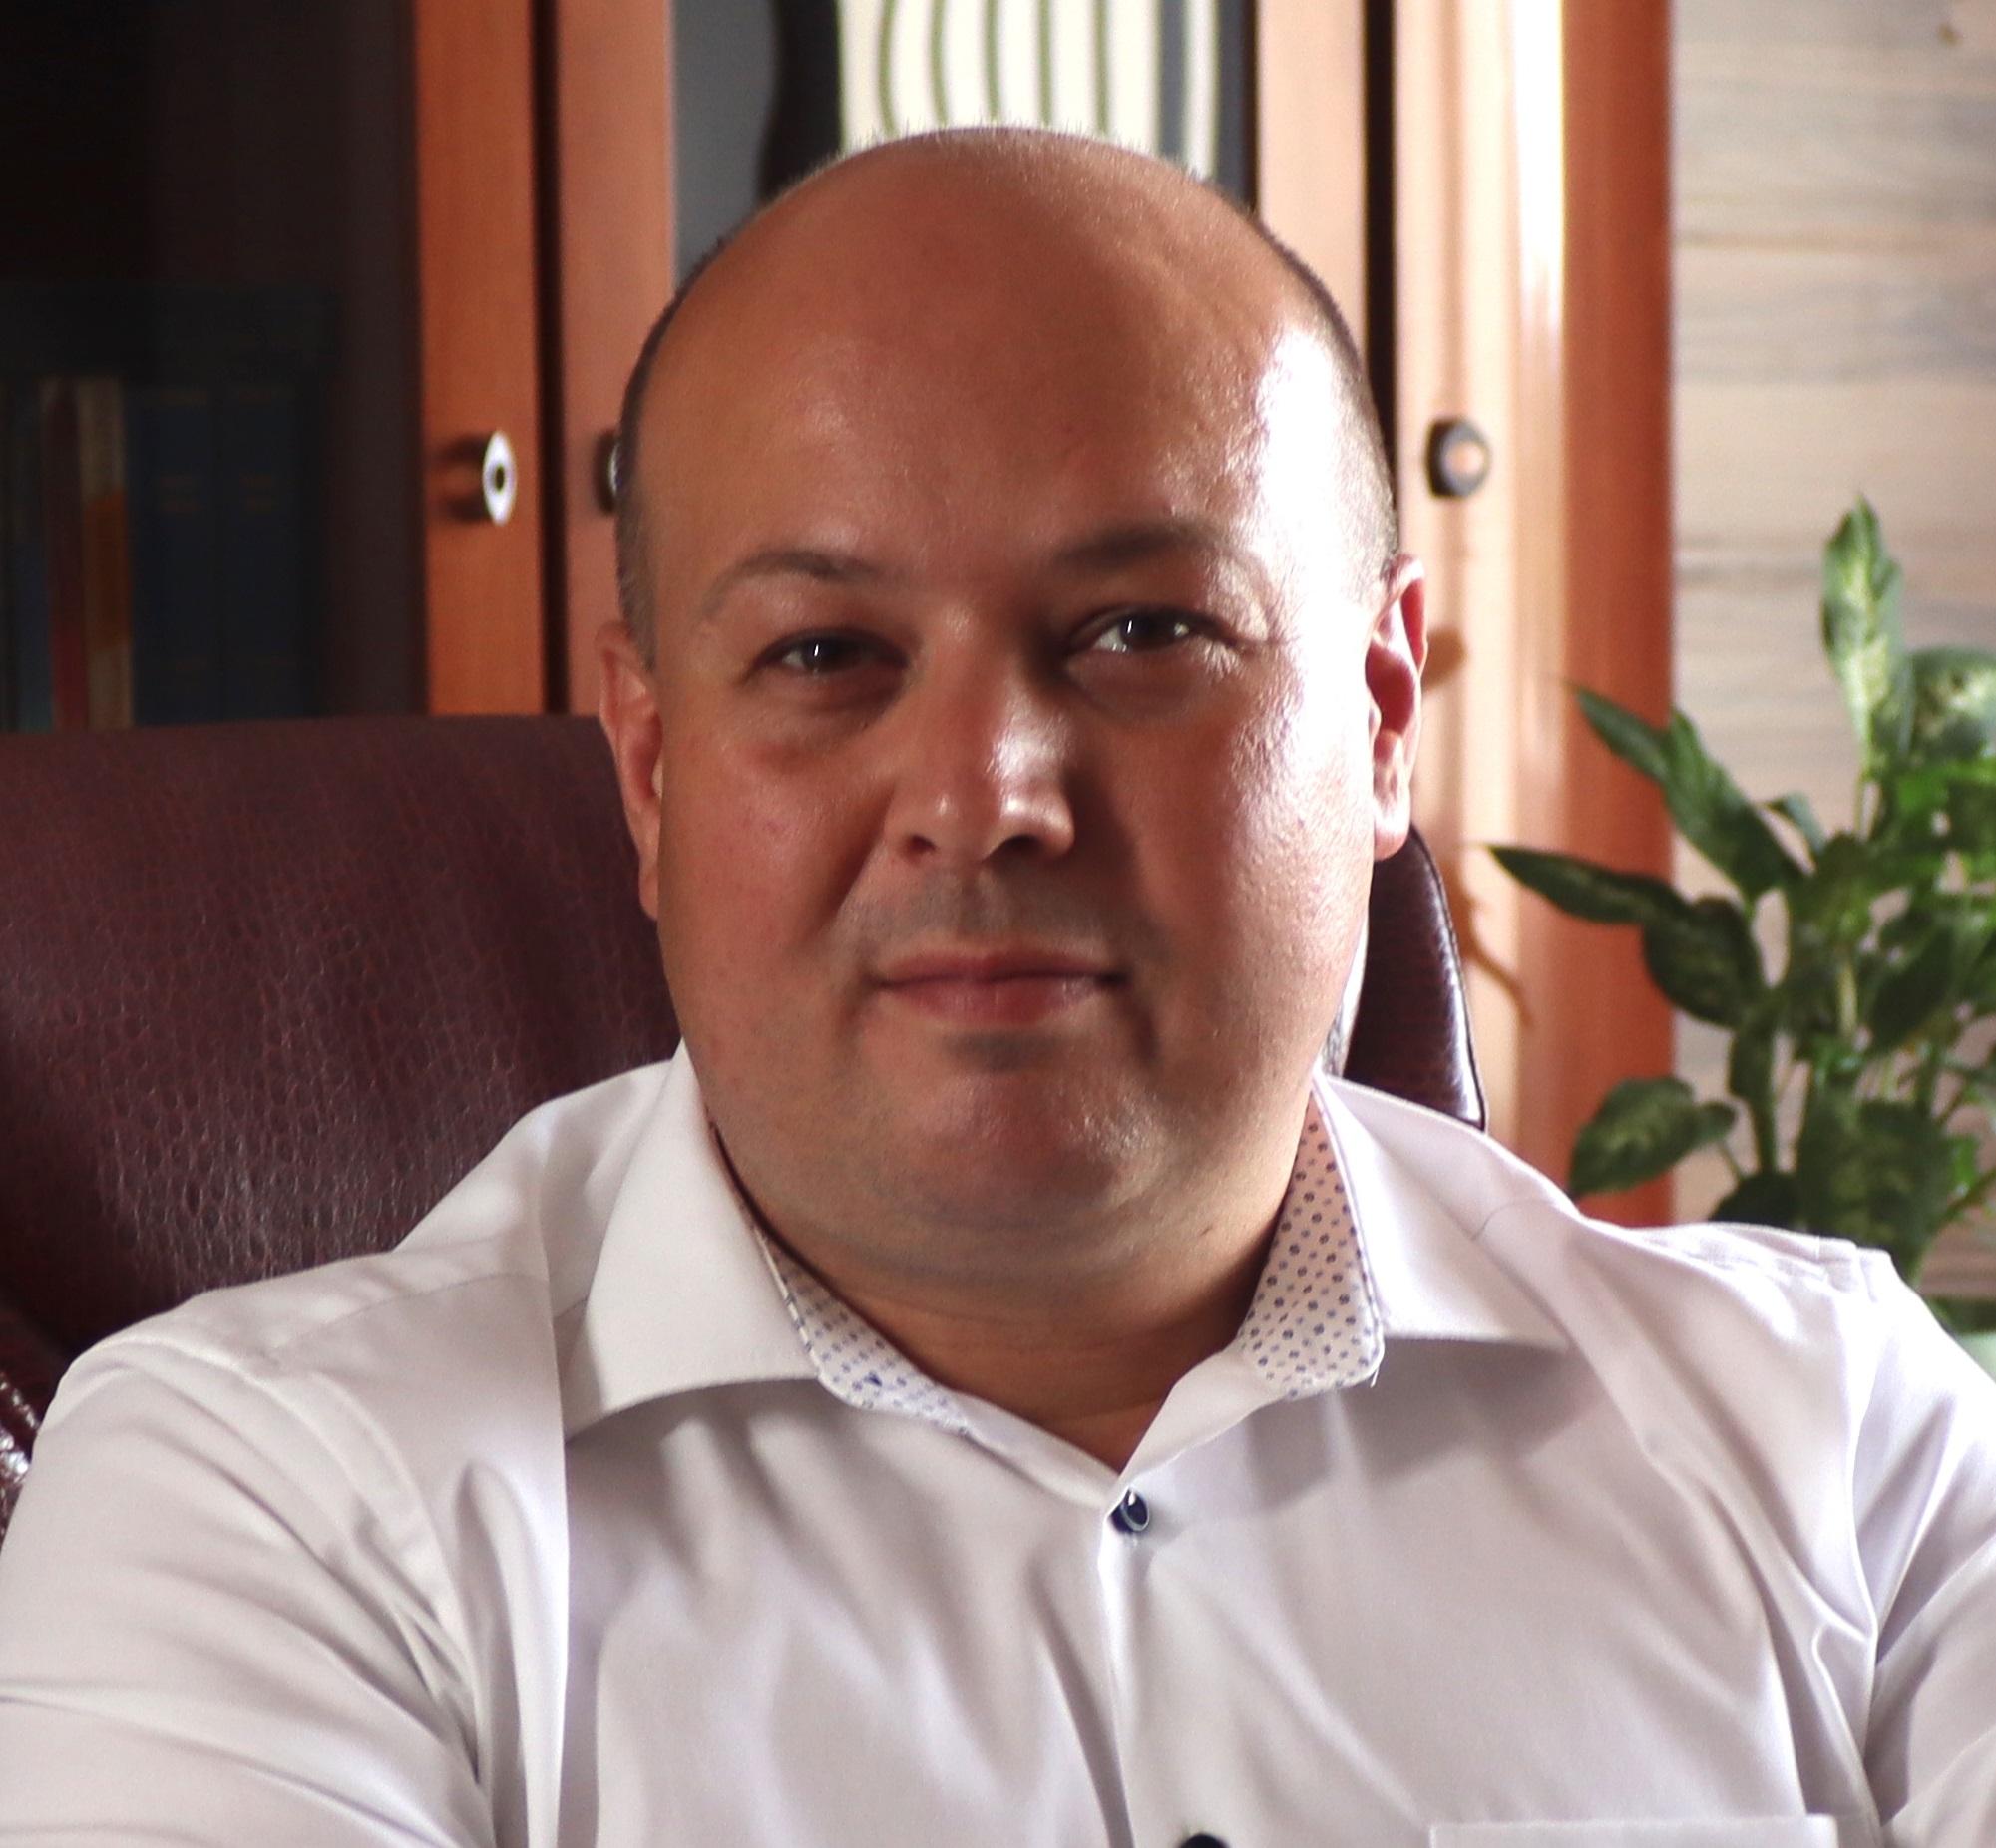 Mircea Vancia